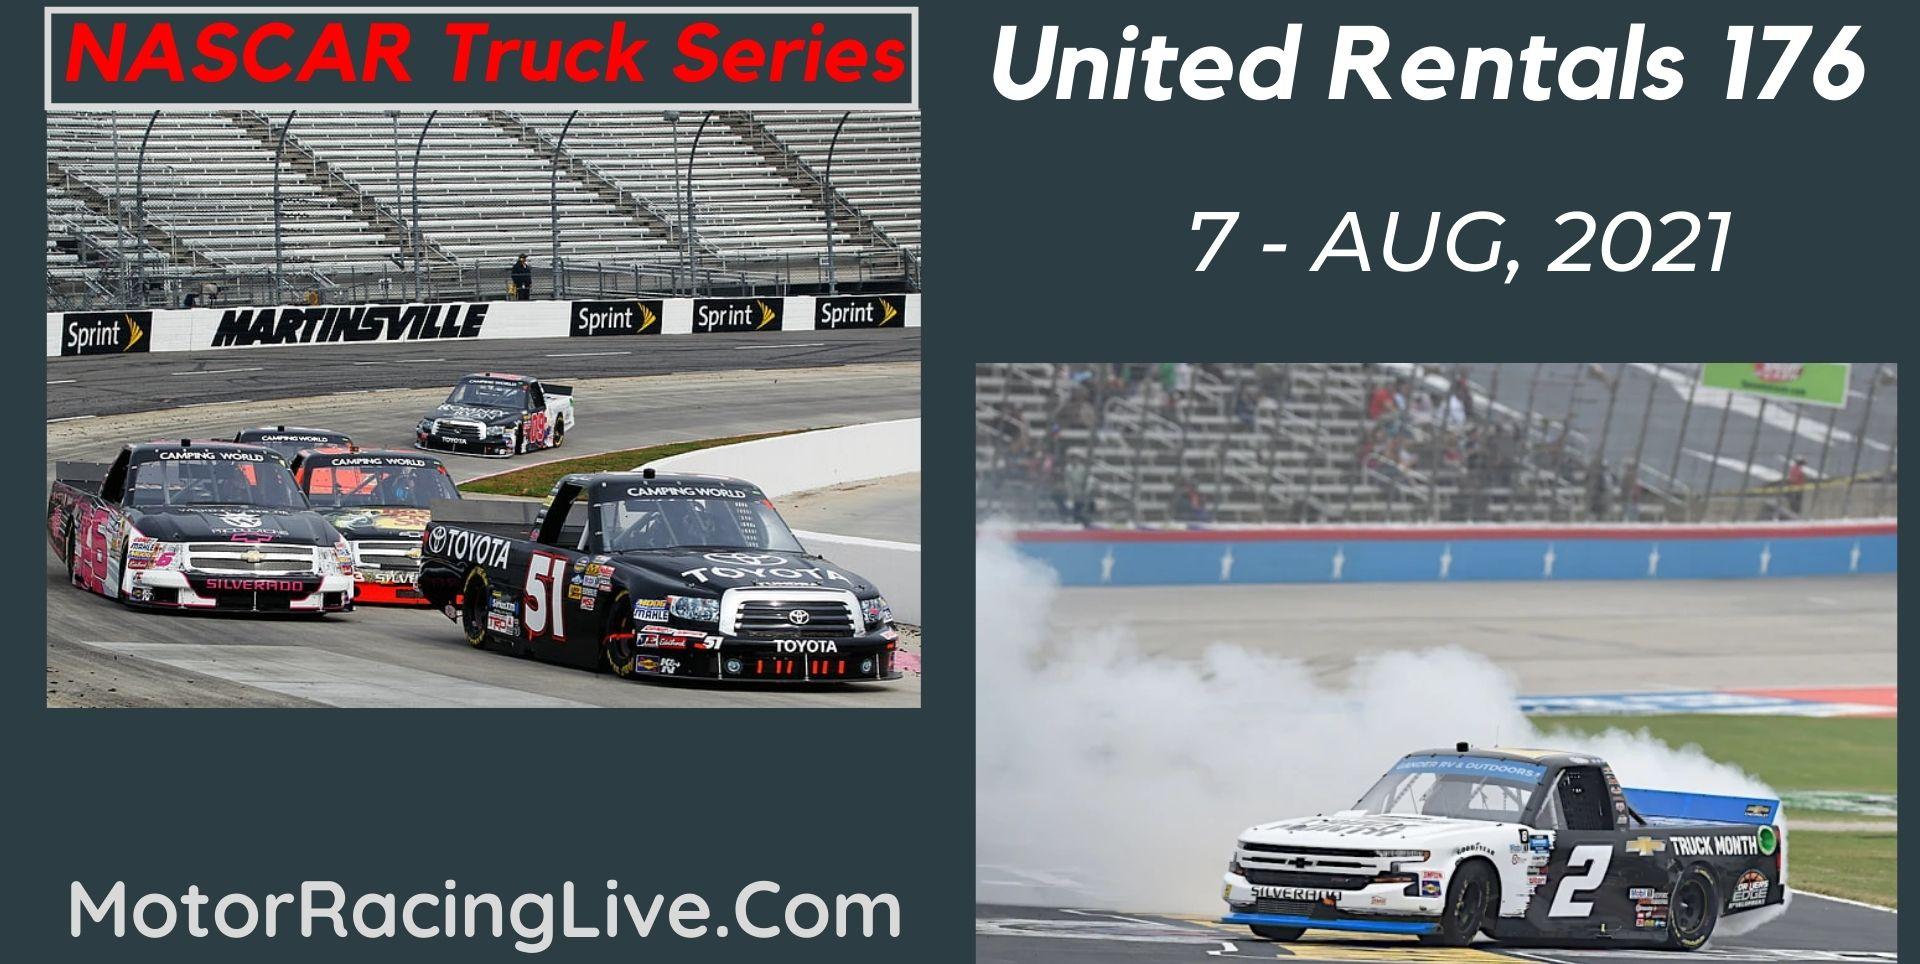 United Rentals 176  Live Stream 2021: NASCAR Truck Series